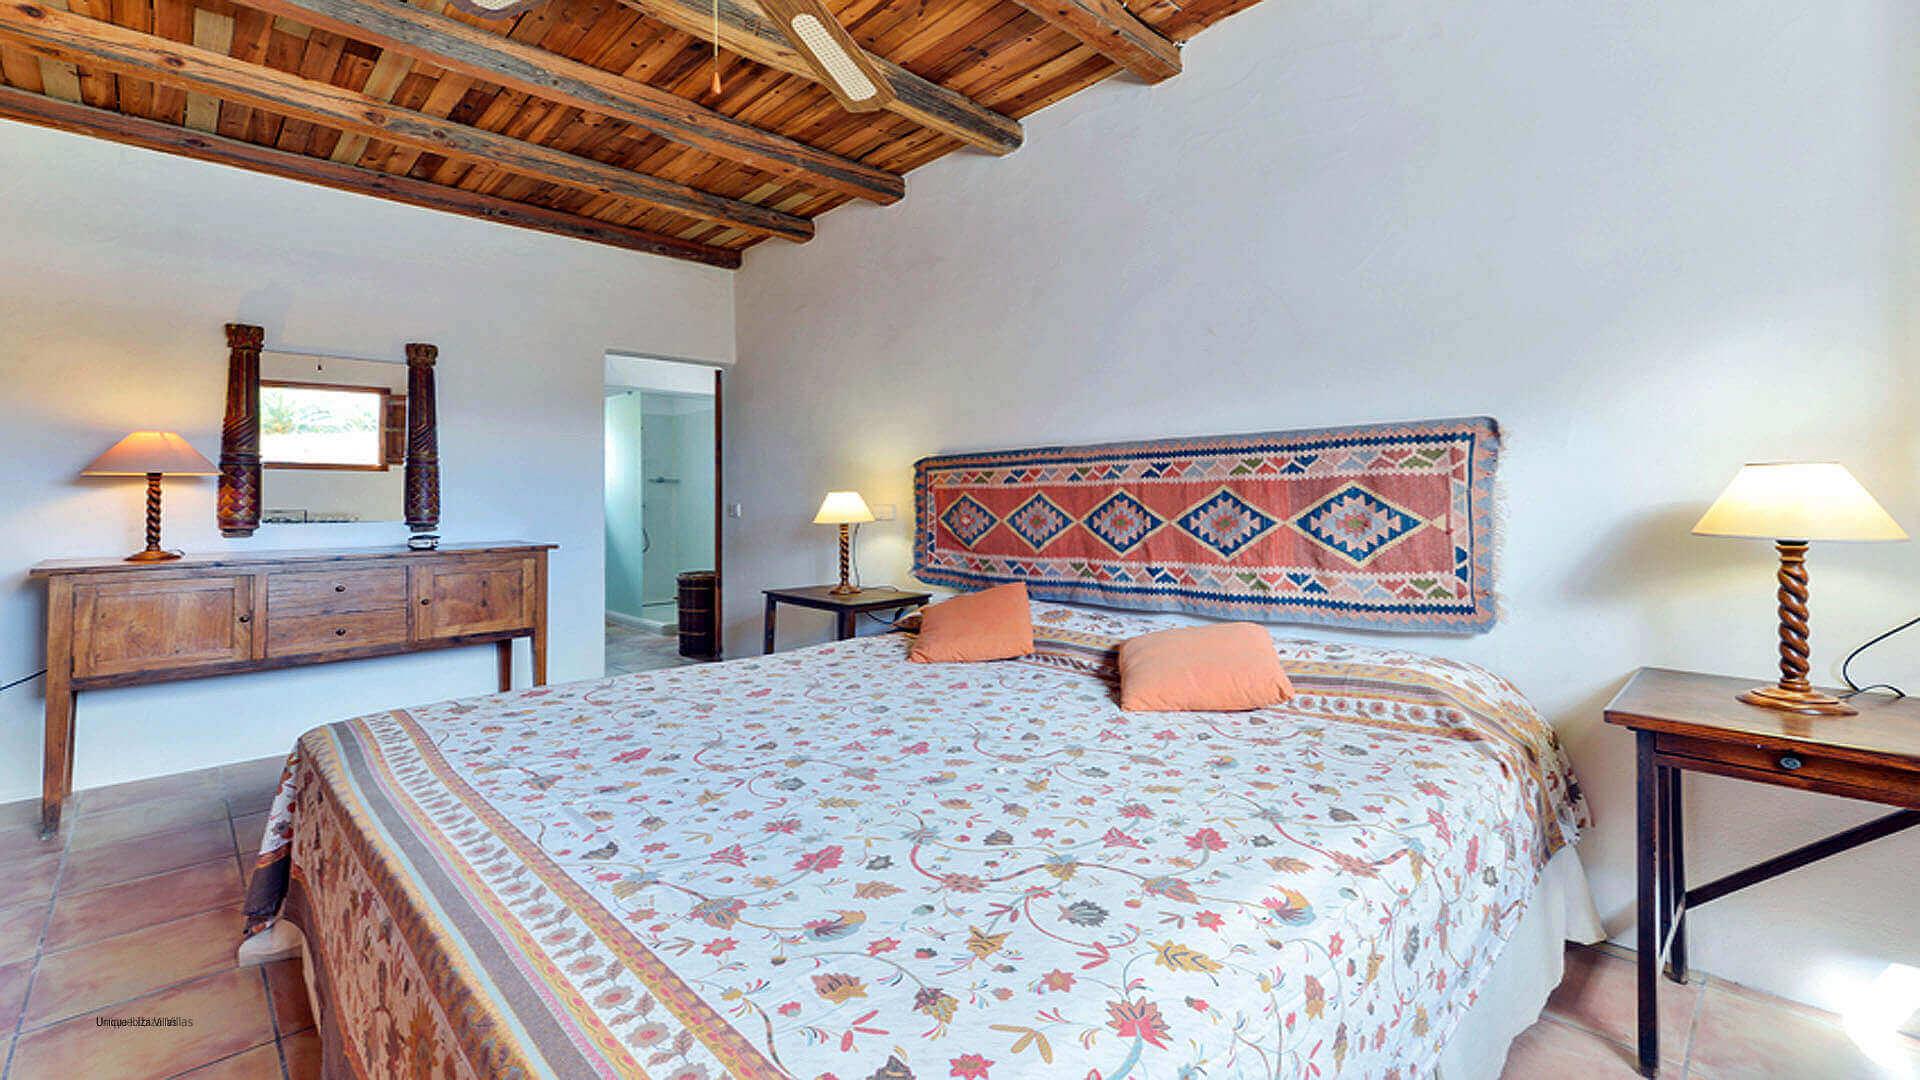 Villa Jaume Dalt Ibiza 19 Bedroom 1